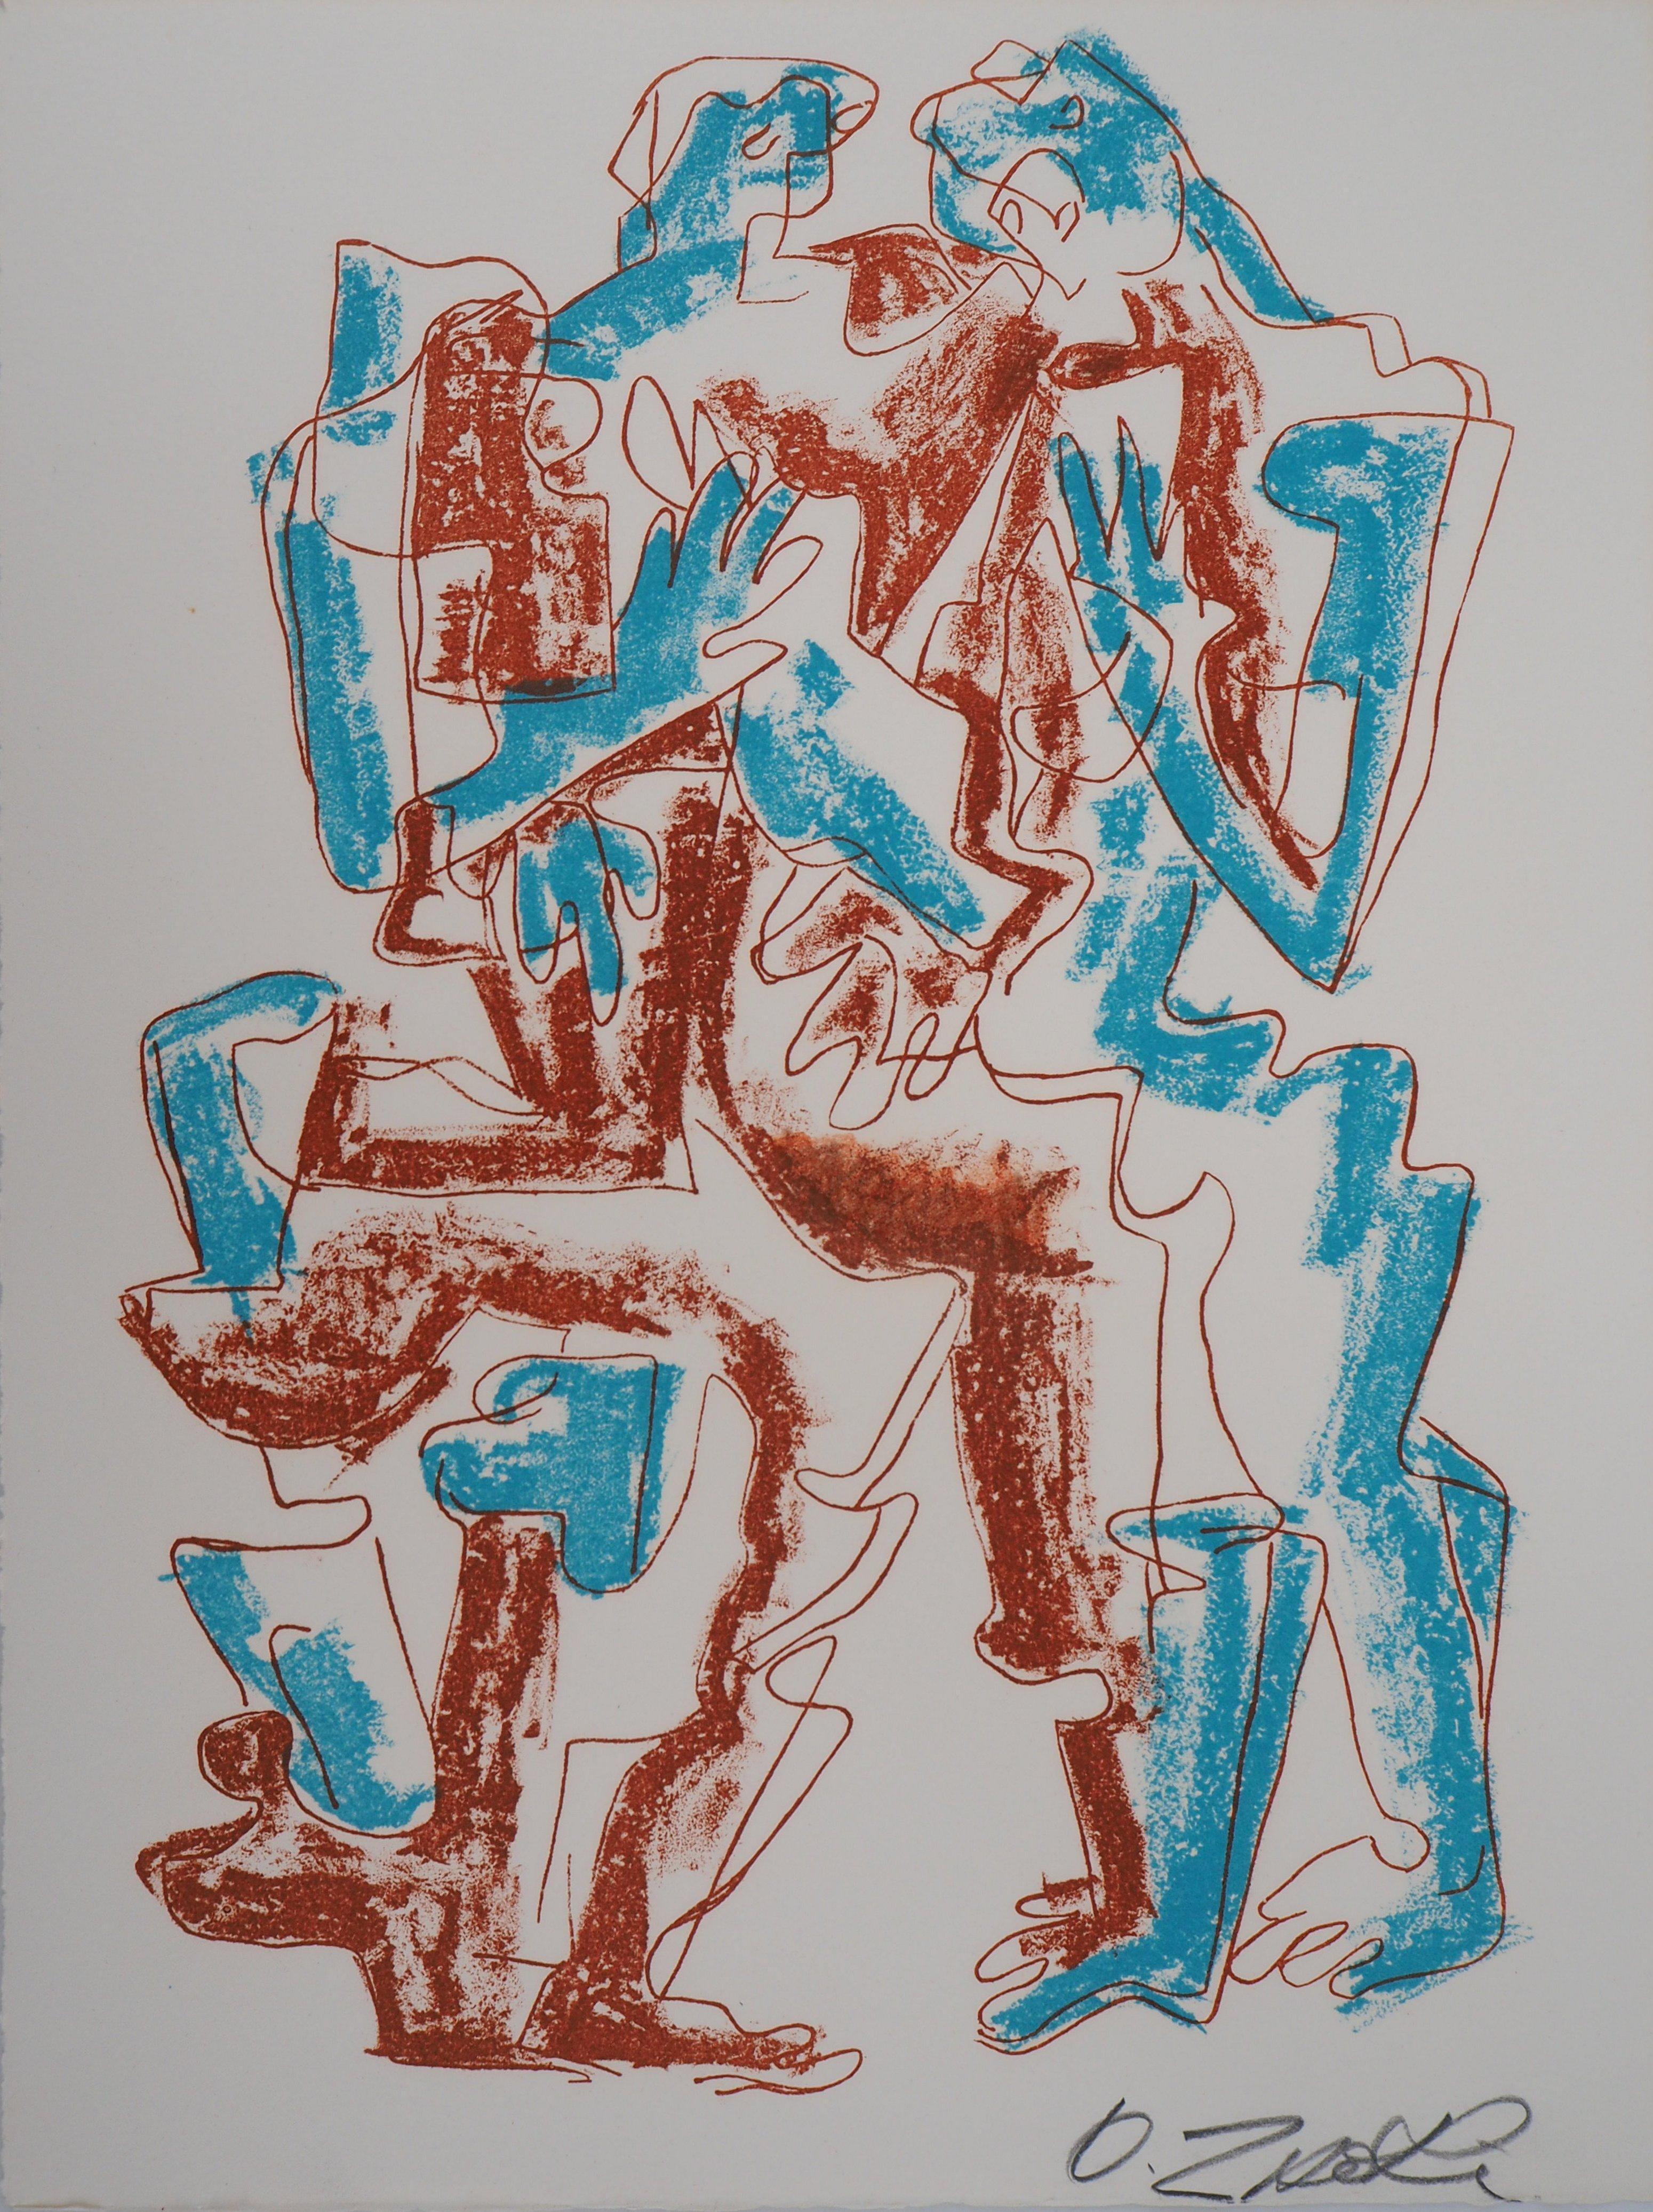 Hugging Couple - Original handsigned lithograph